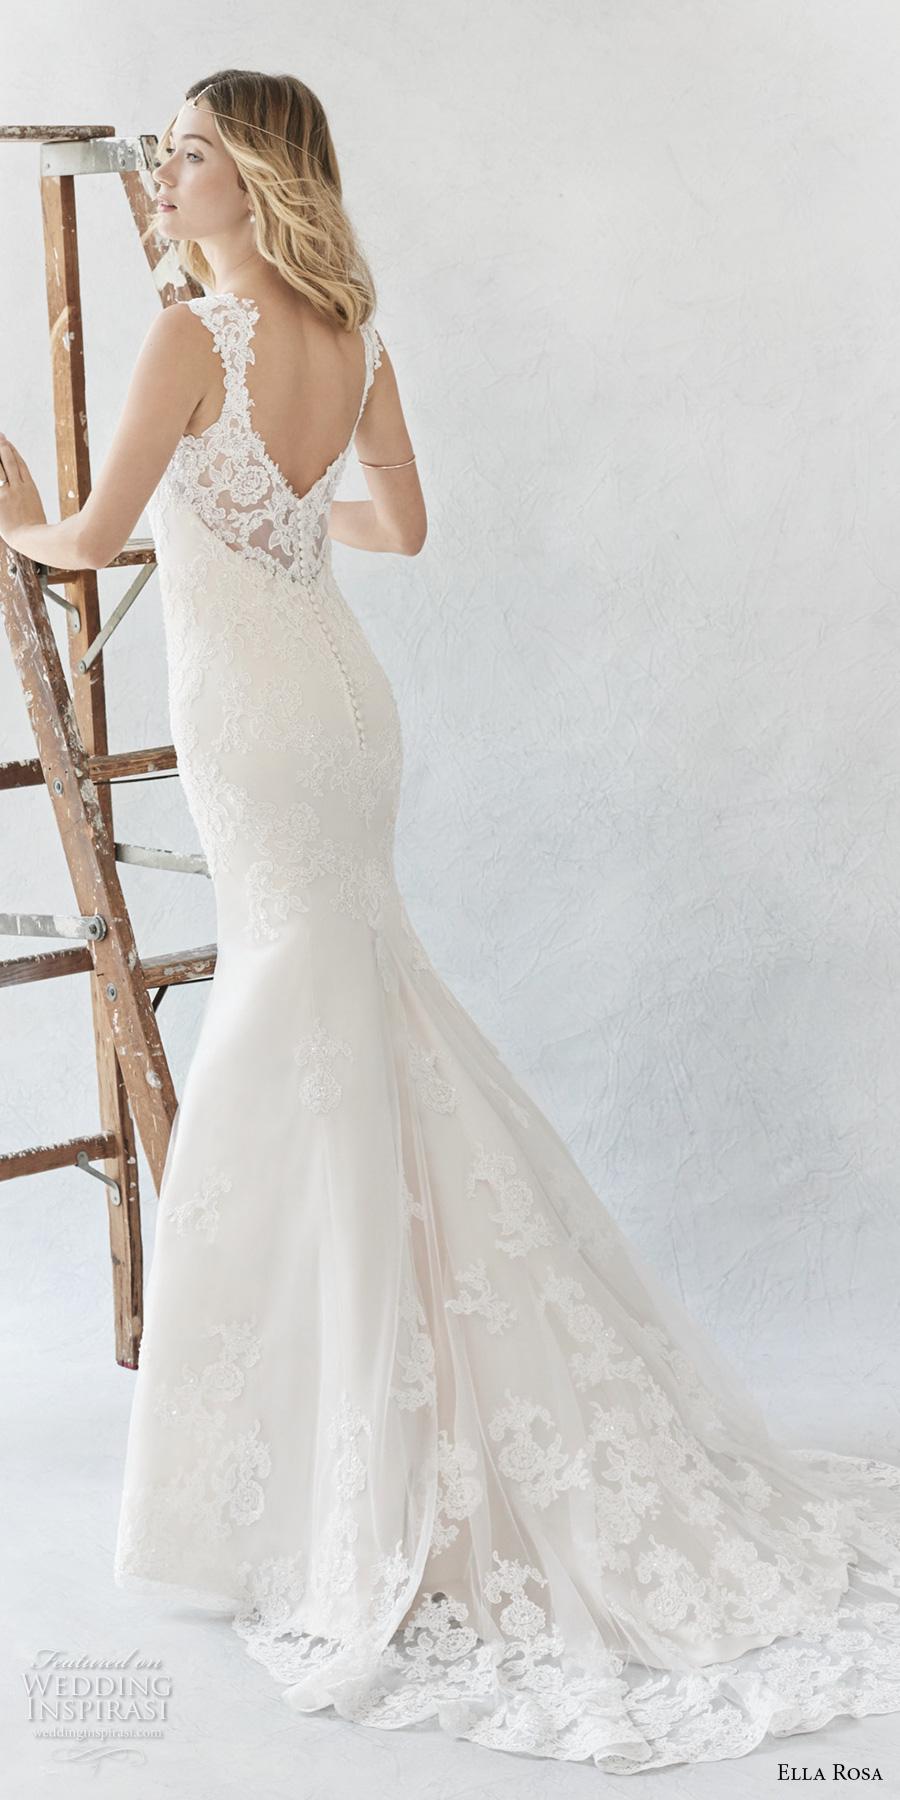 ella rosa spring 2017 bridal sleeveless sheer bateau sweetheart neckline heavily embellished bodice elegant sheath wedding dress open scoop back chapel train (370) bv